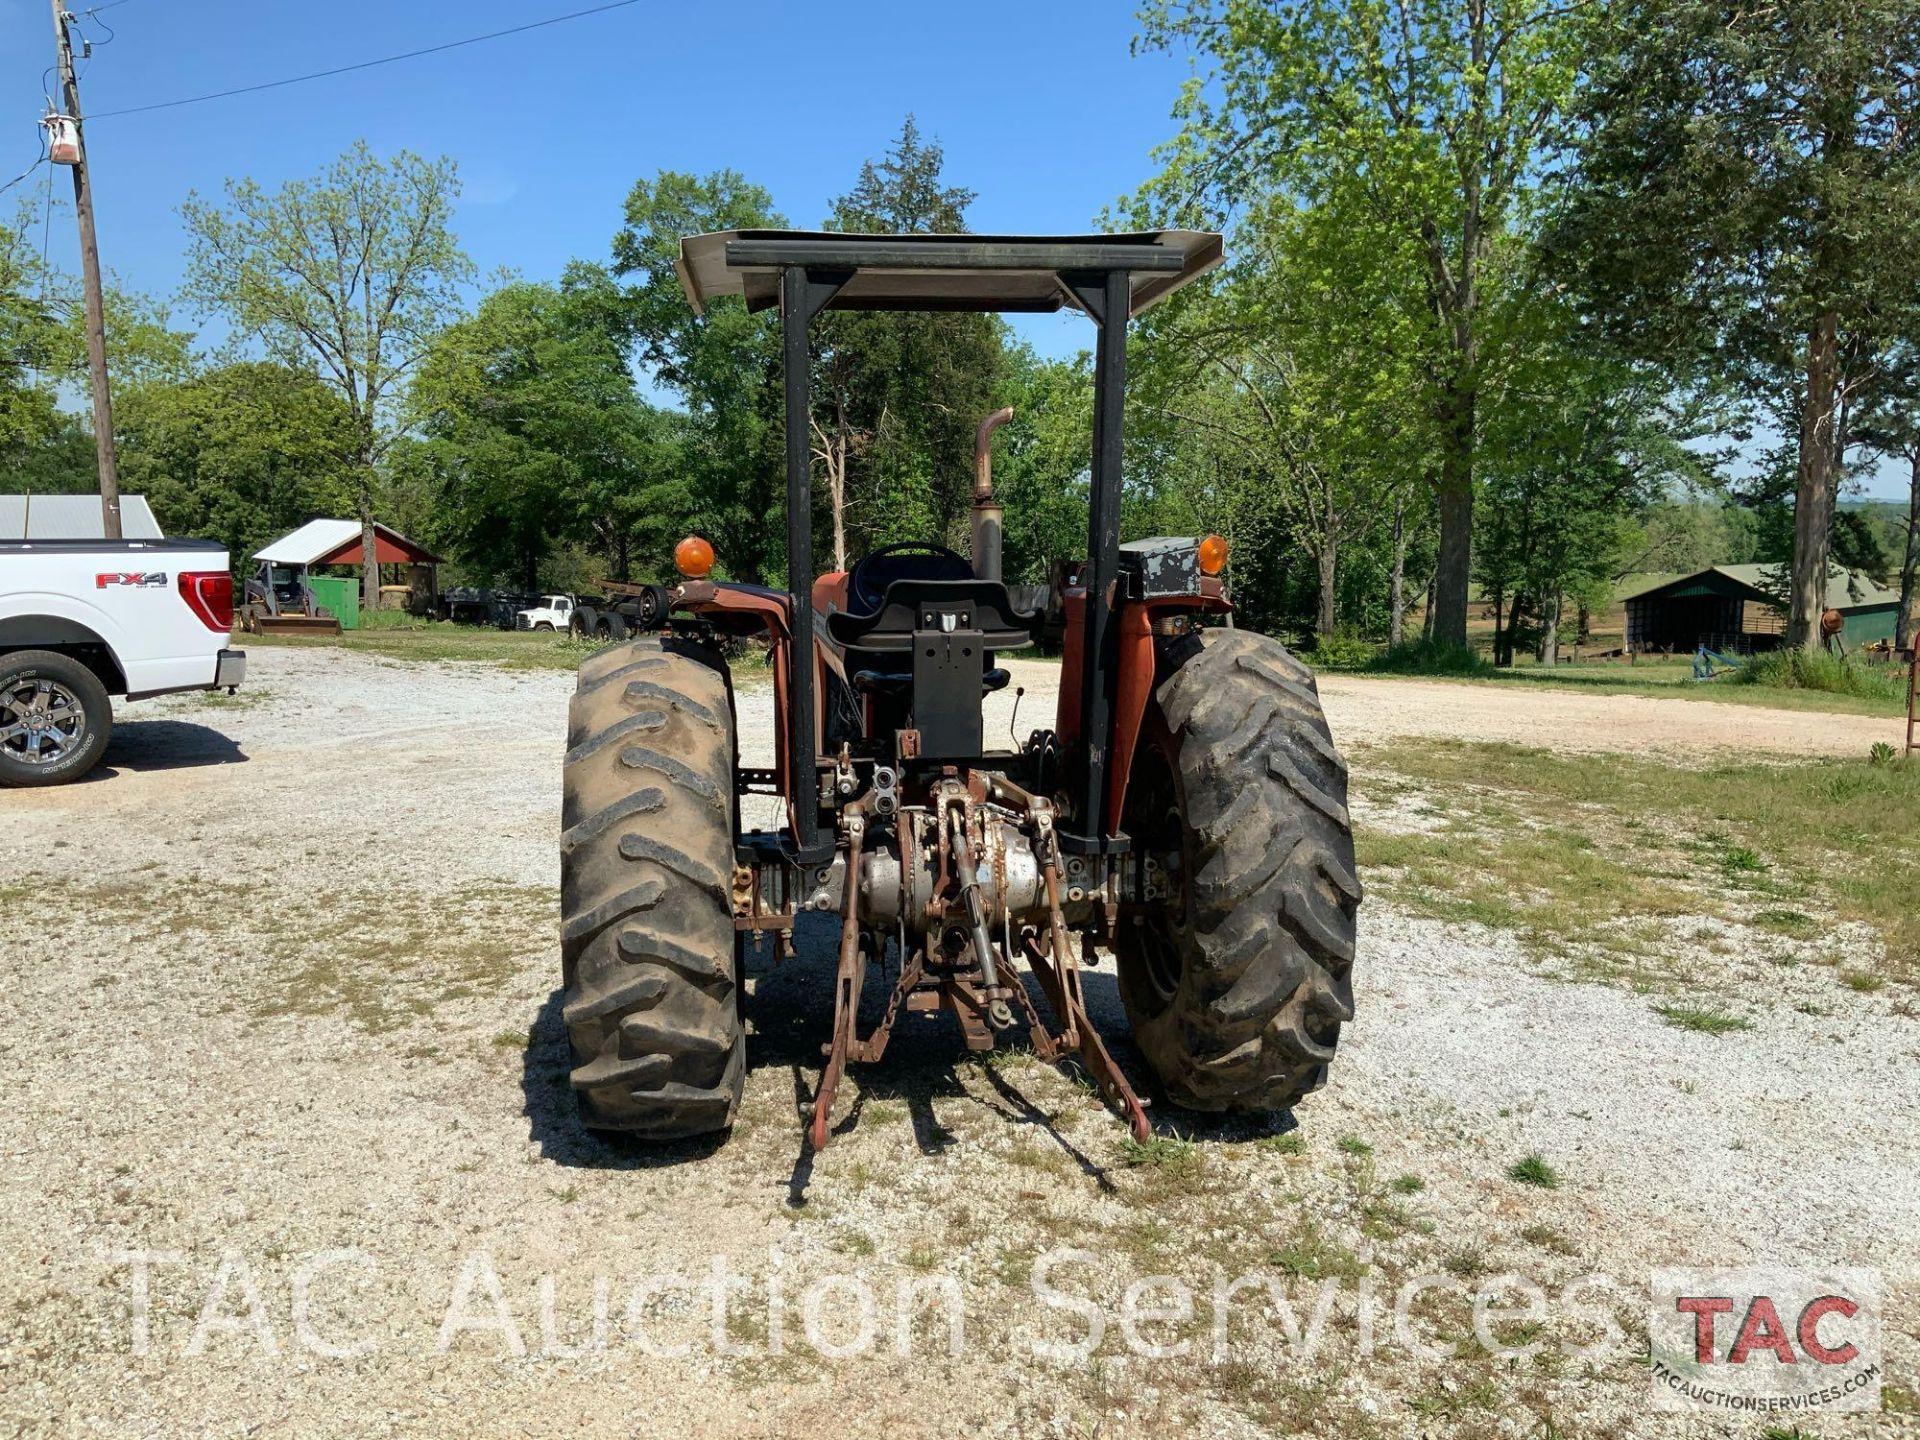 Massey Ferguson 265 FarmTractor - Image 7 of 23